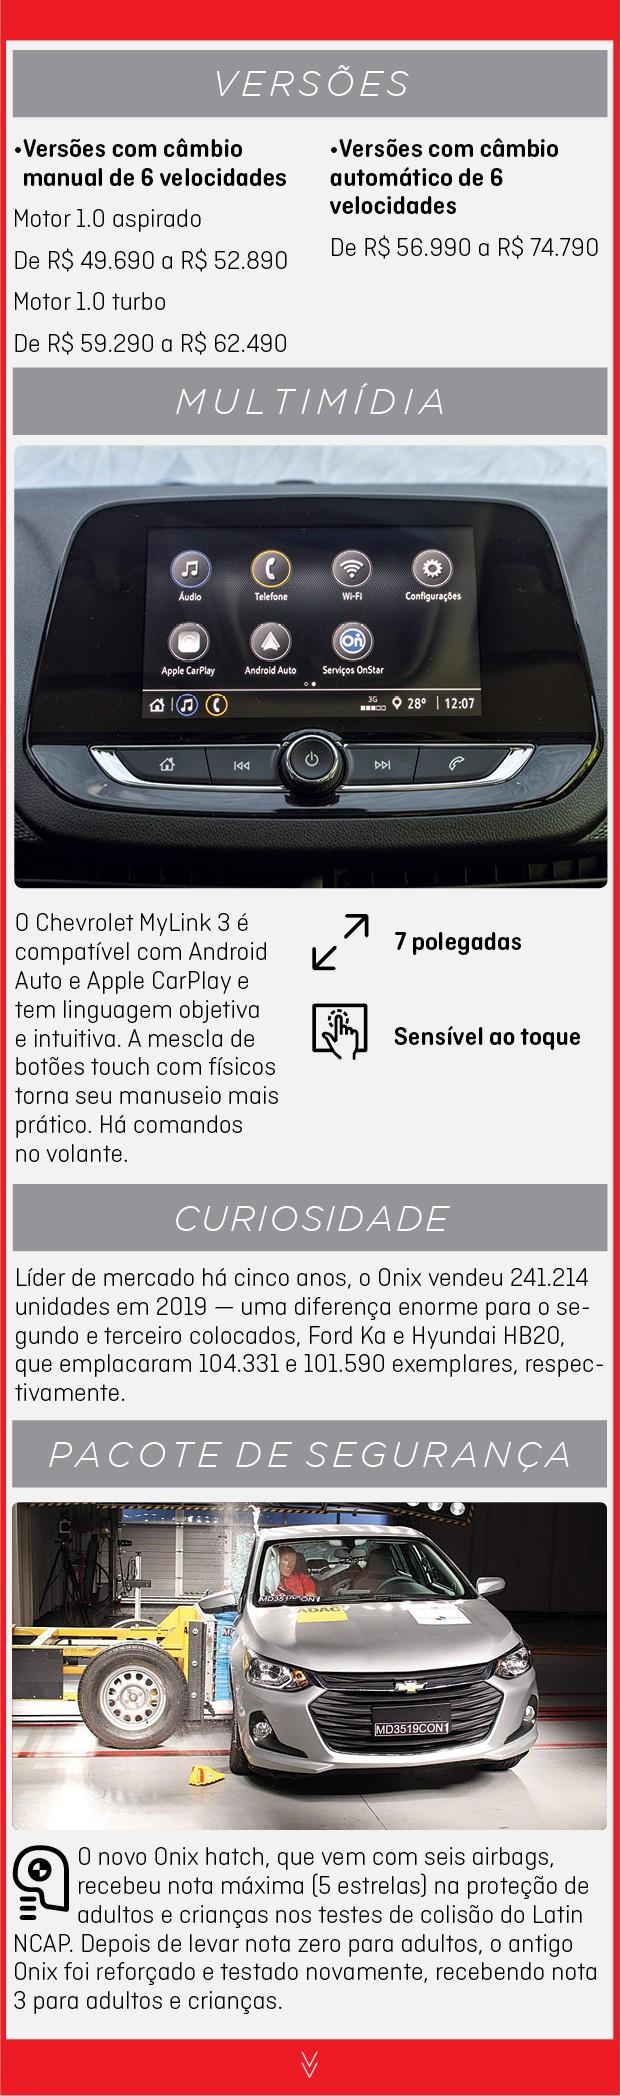 Chevrolet Onix LTZ 1.0 turbo manual (Foto: André Schaun)